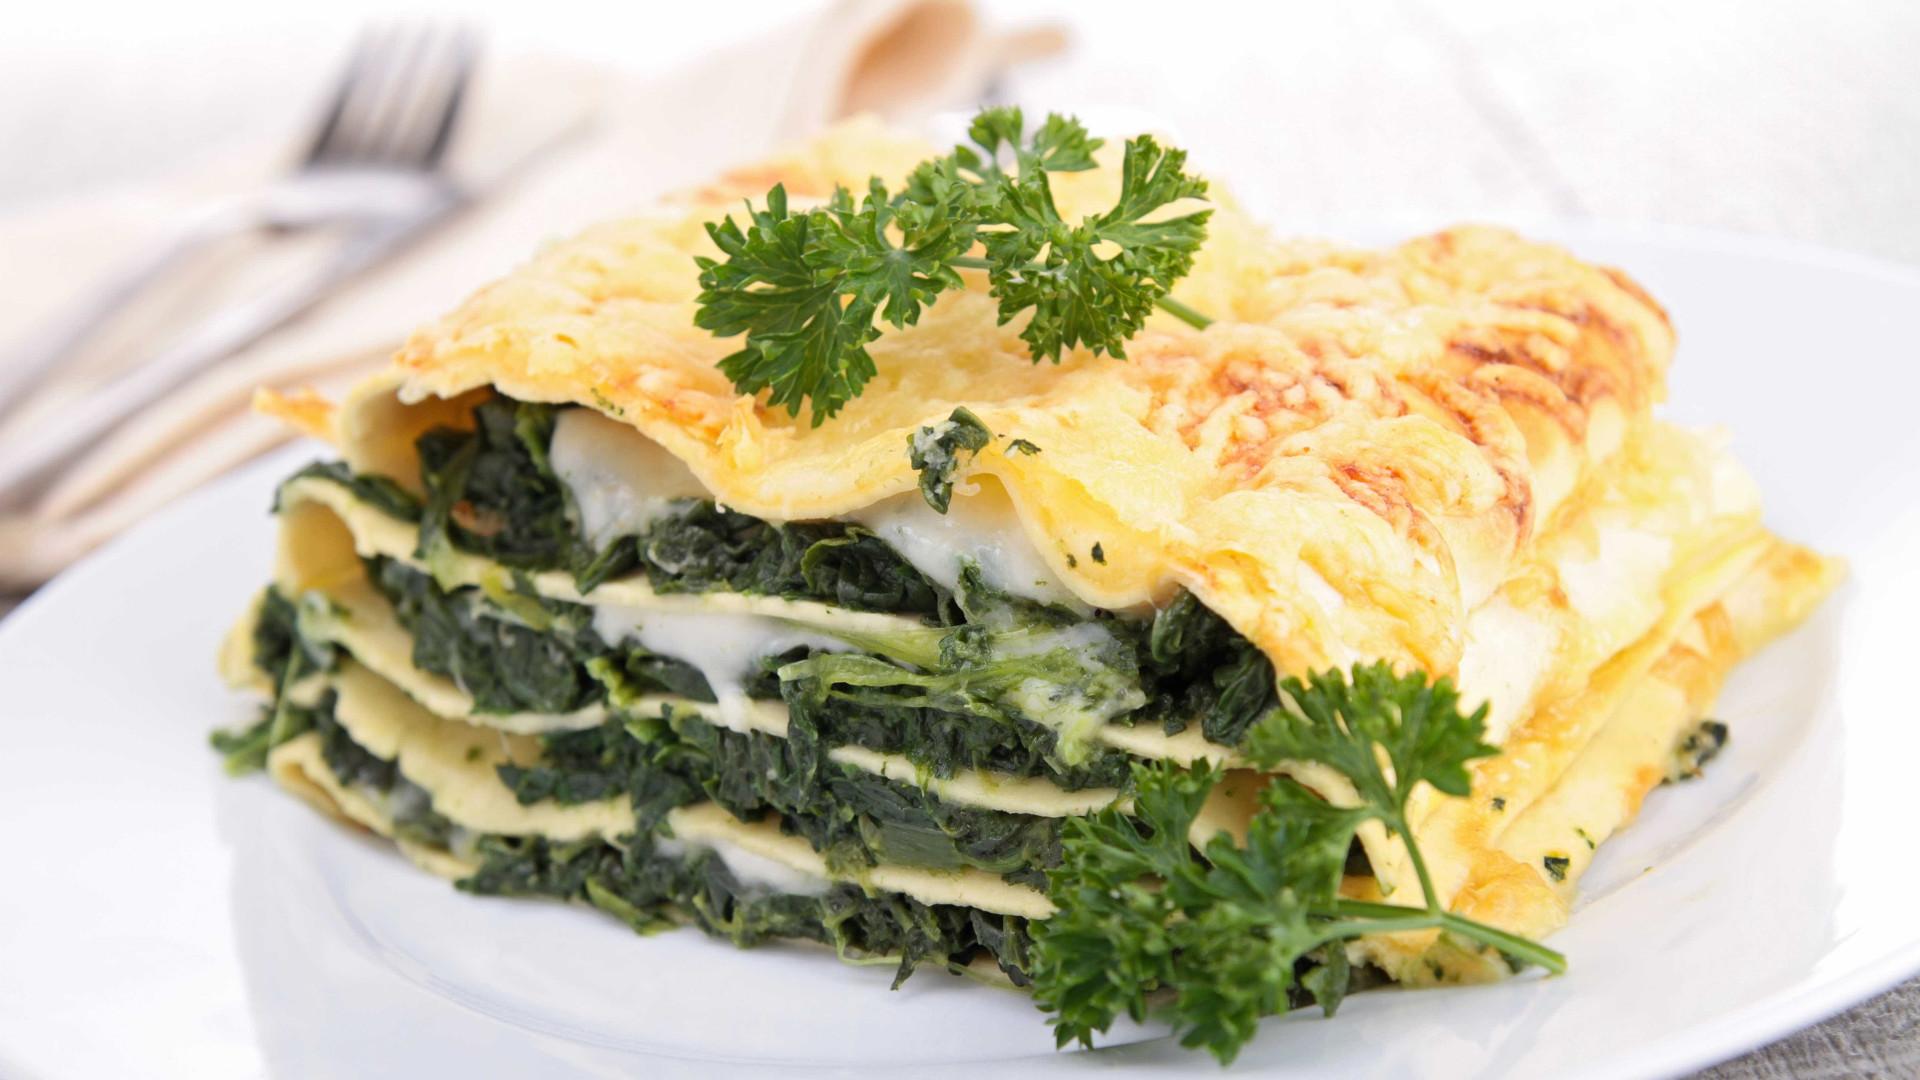 Lasanha de espinafre utiliza produtos da safra de primavera; aprenda